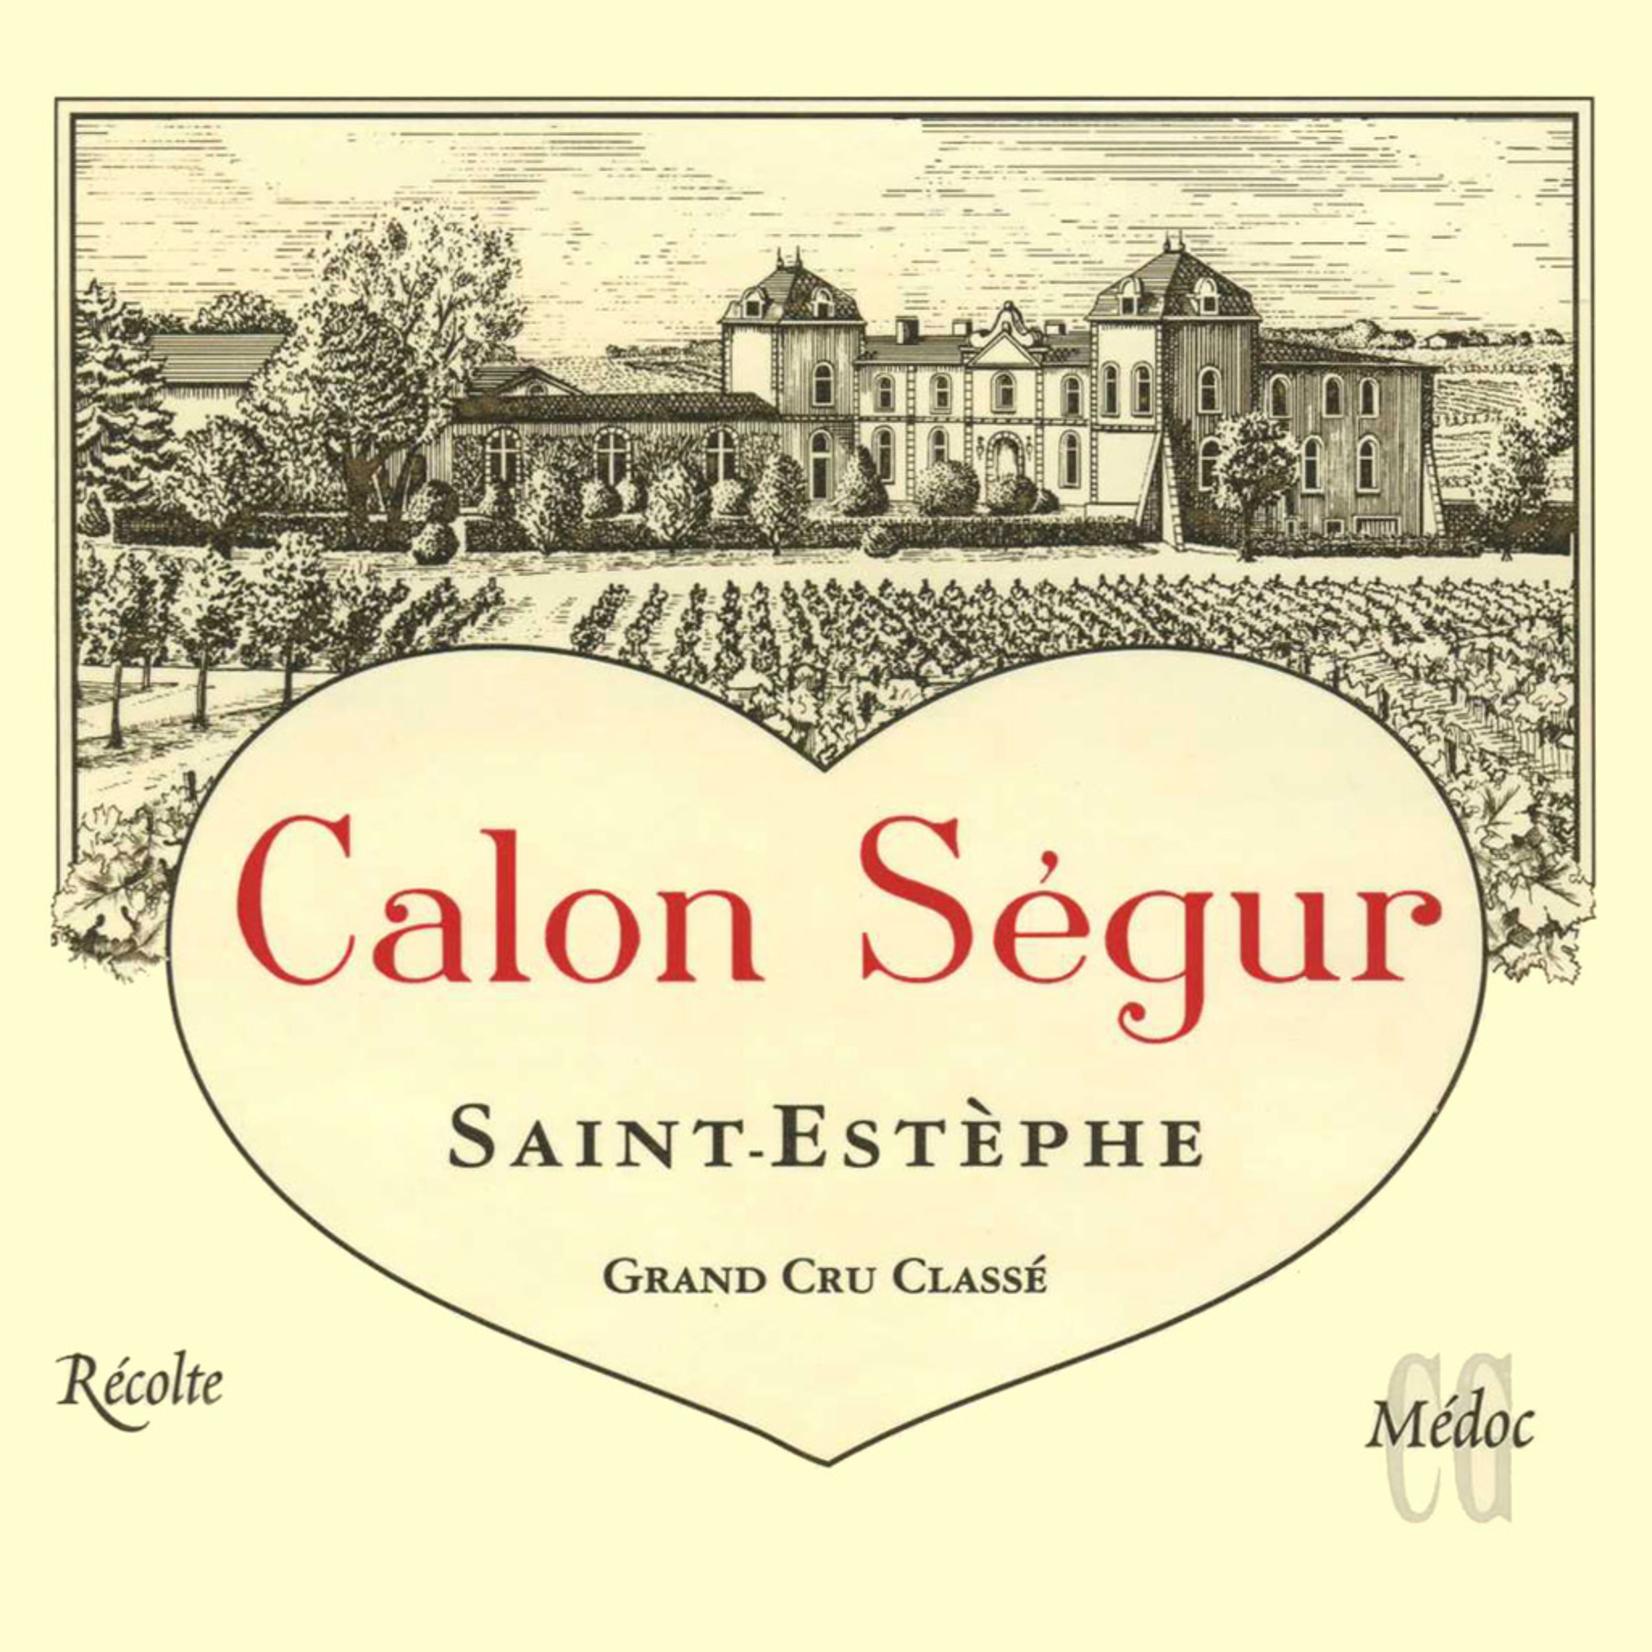 Wine Chateau Calon Segur 2007